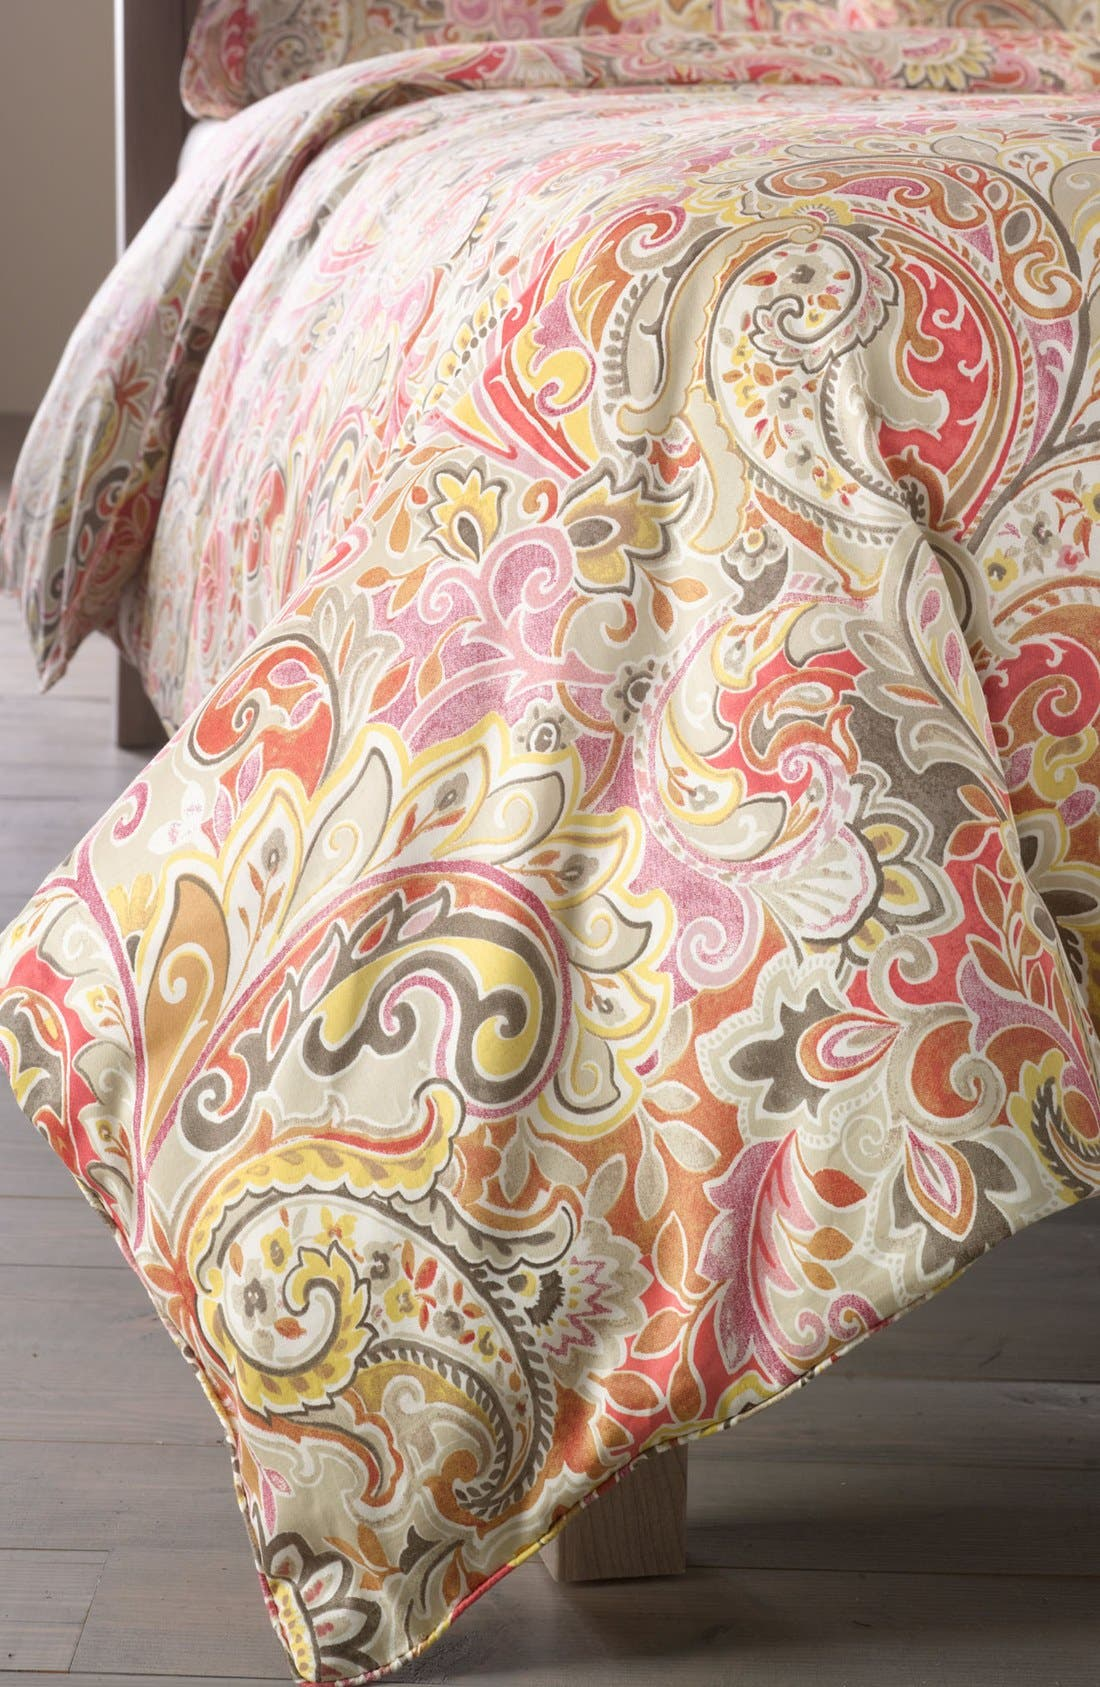 Main Image - Next Creations 'Wonderland Spice' Duvet Cover